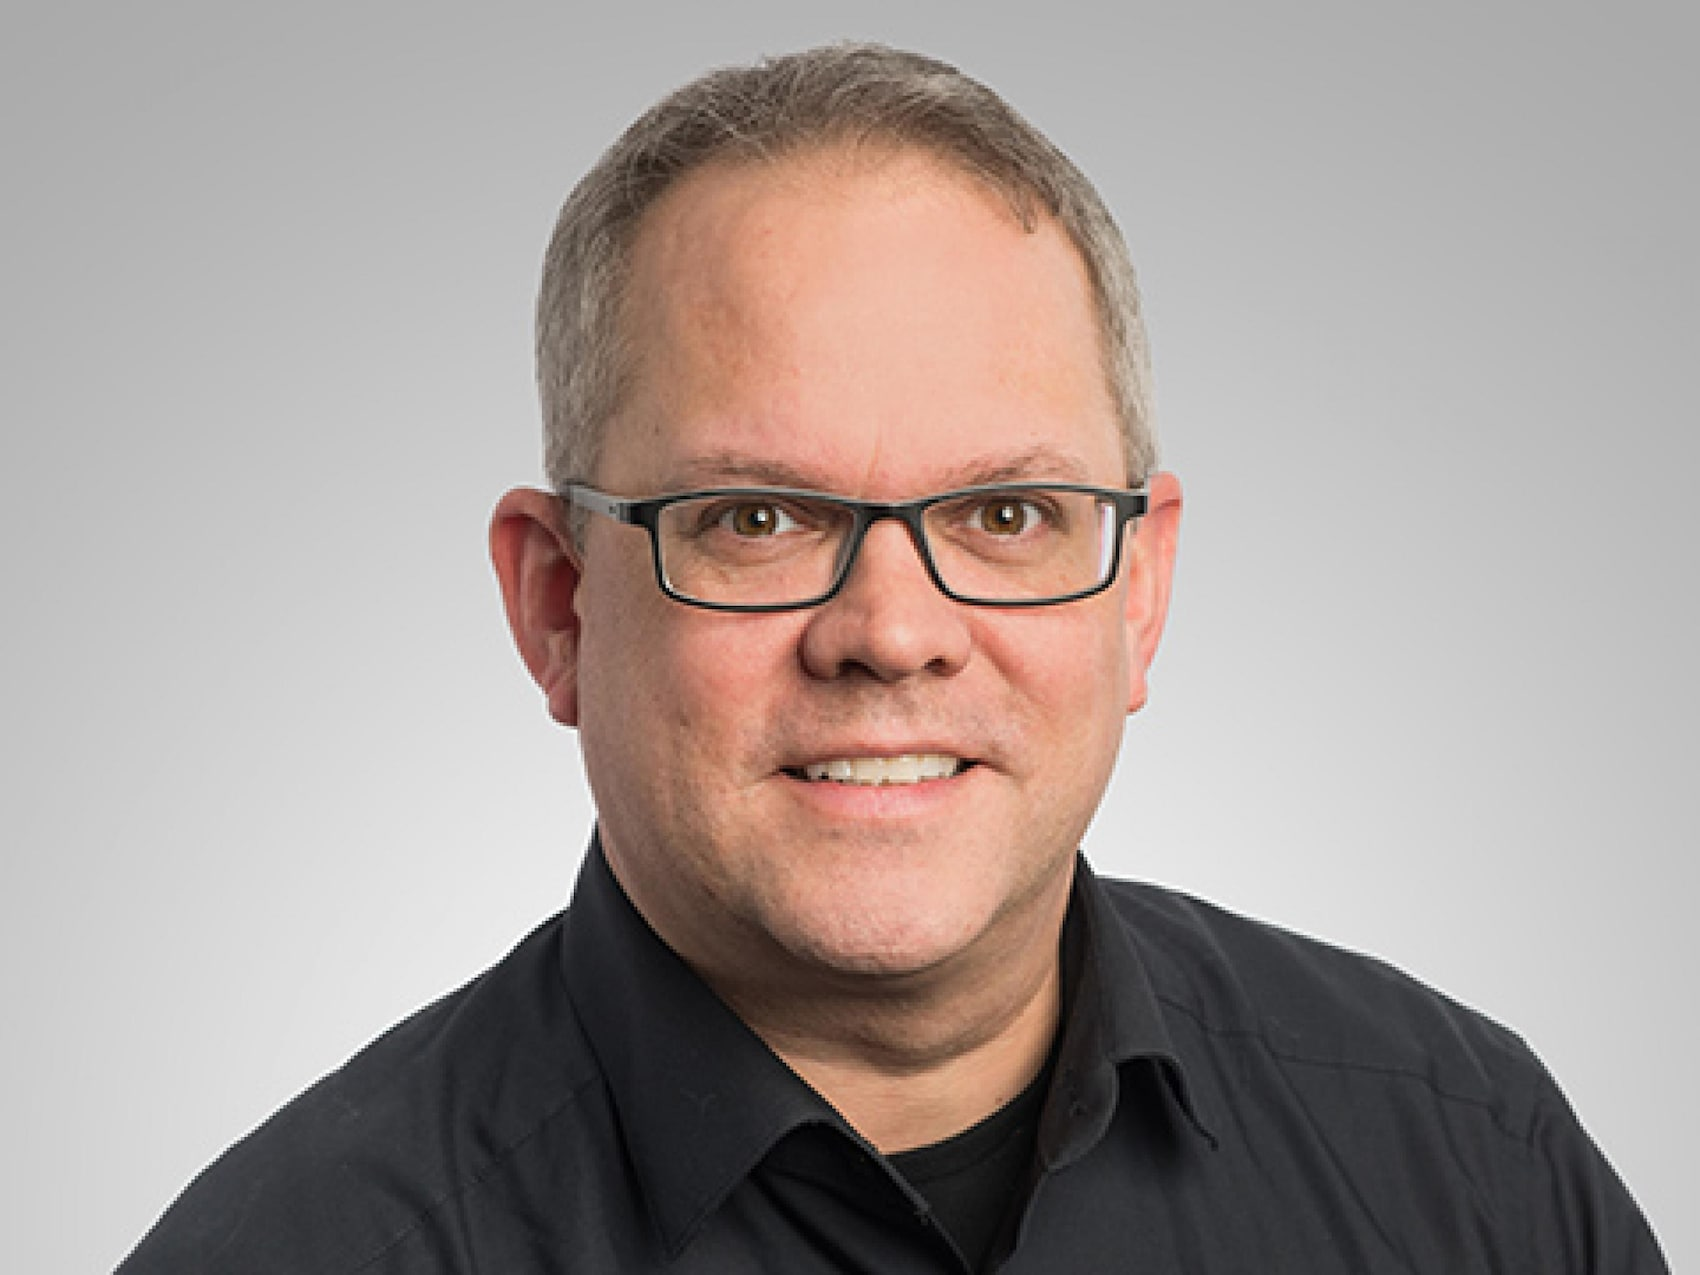 Ansprechpartner Frank Reinert